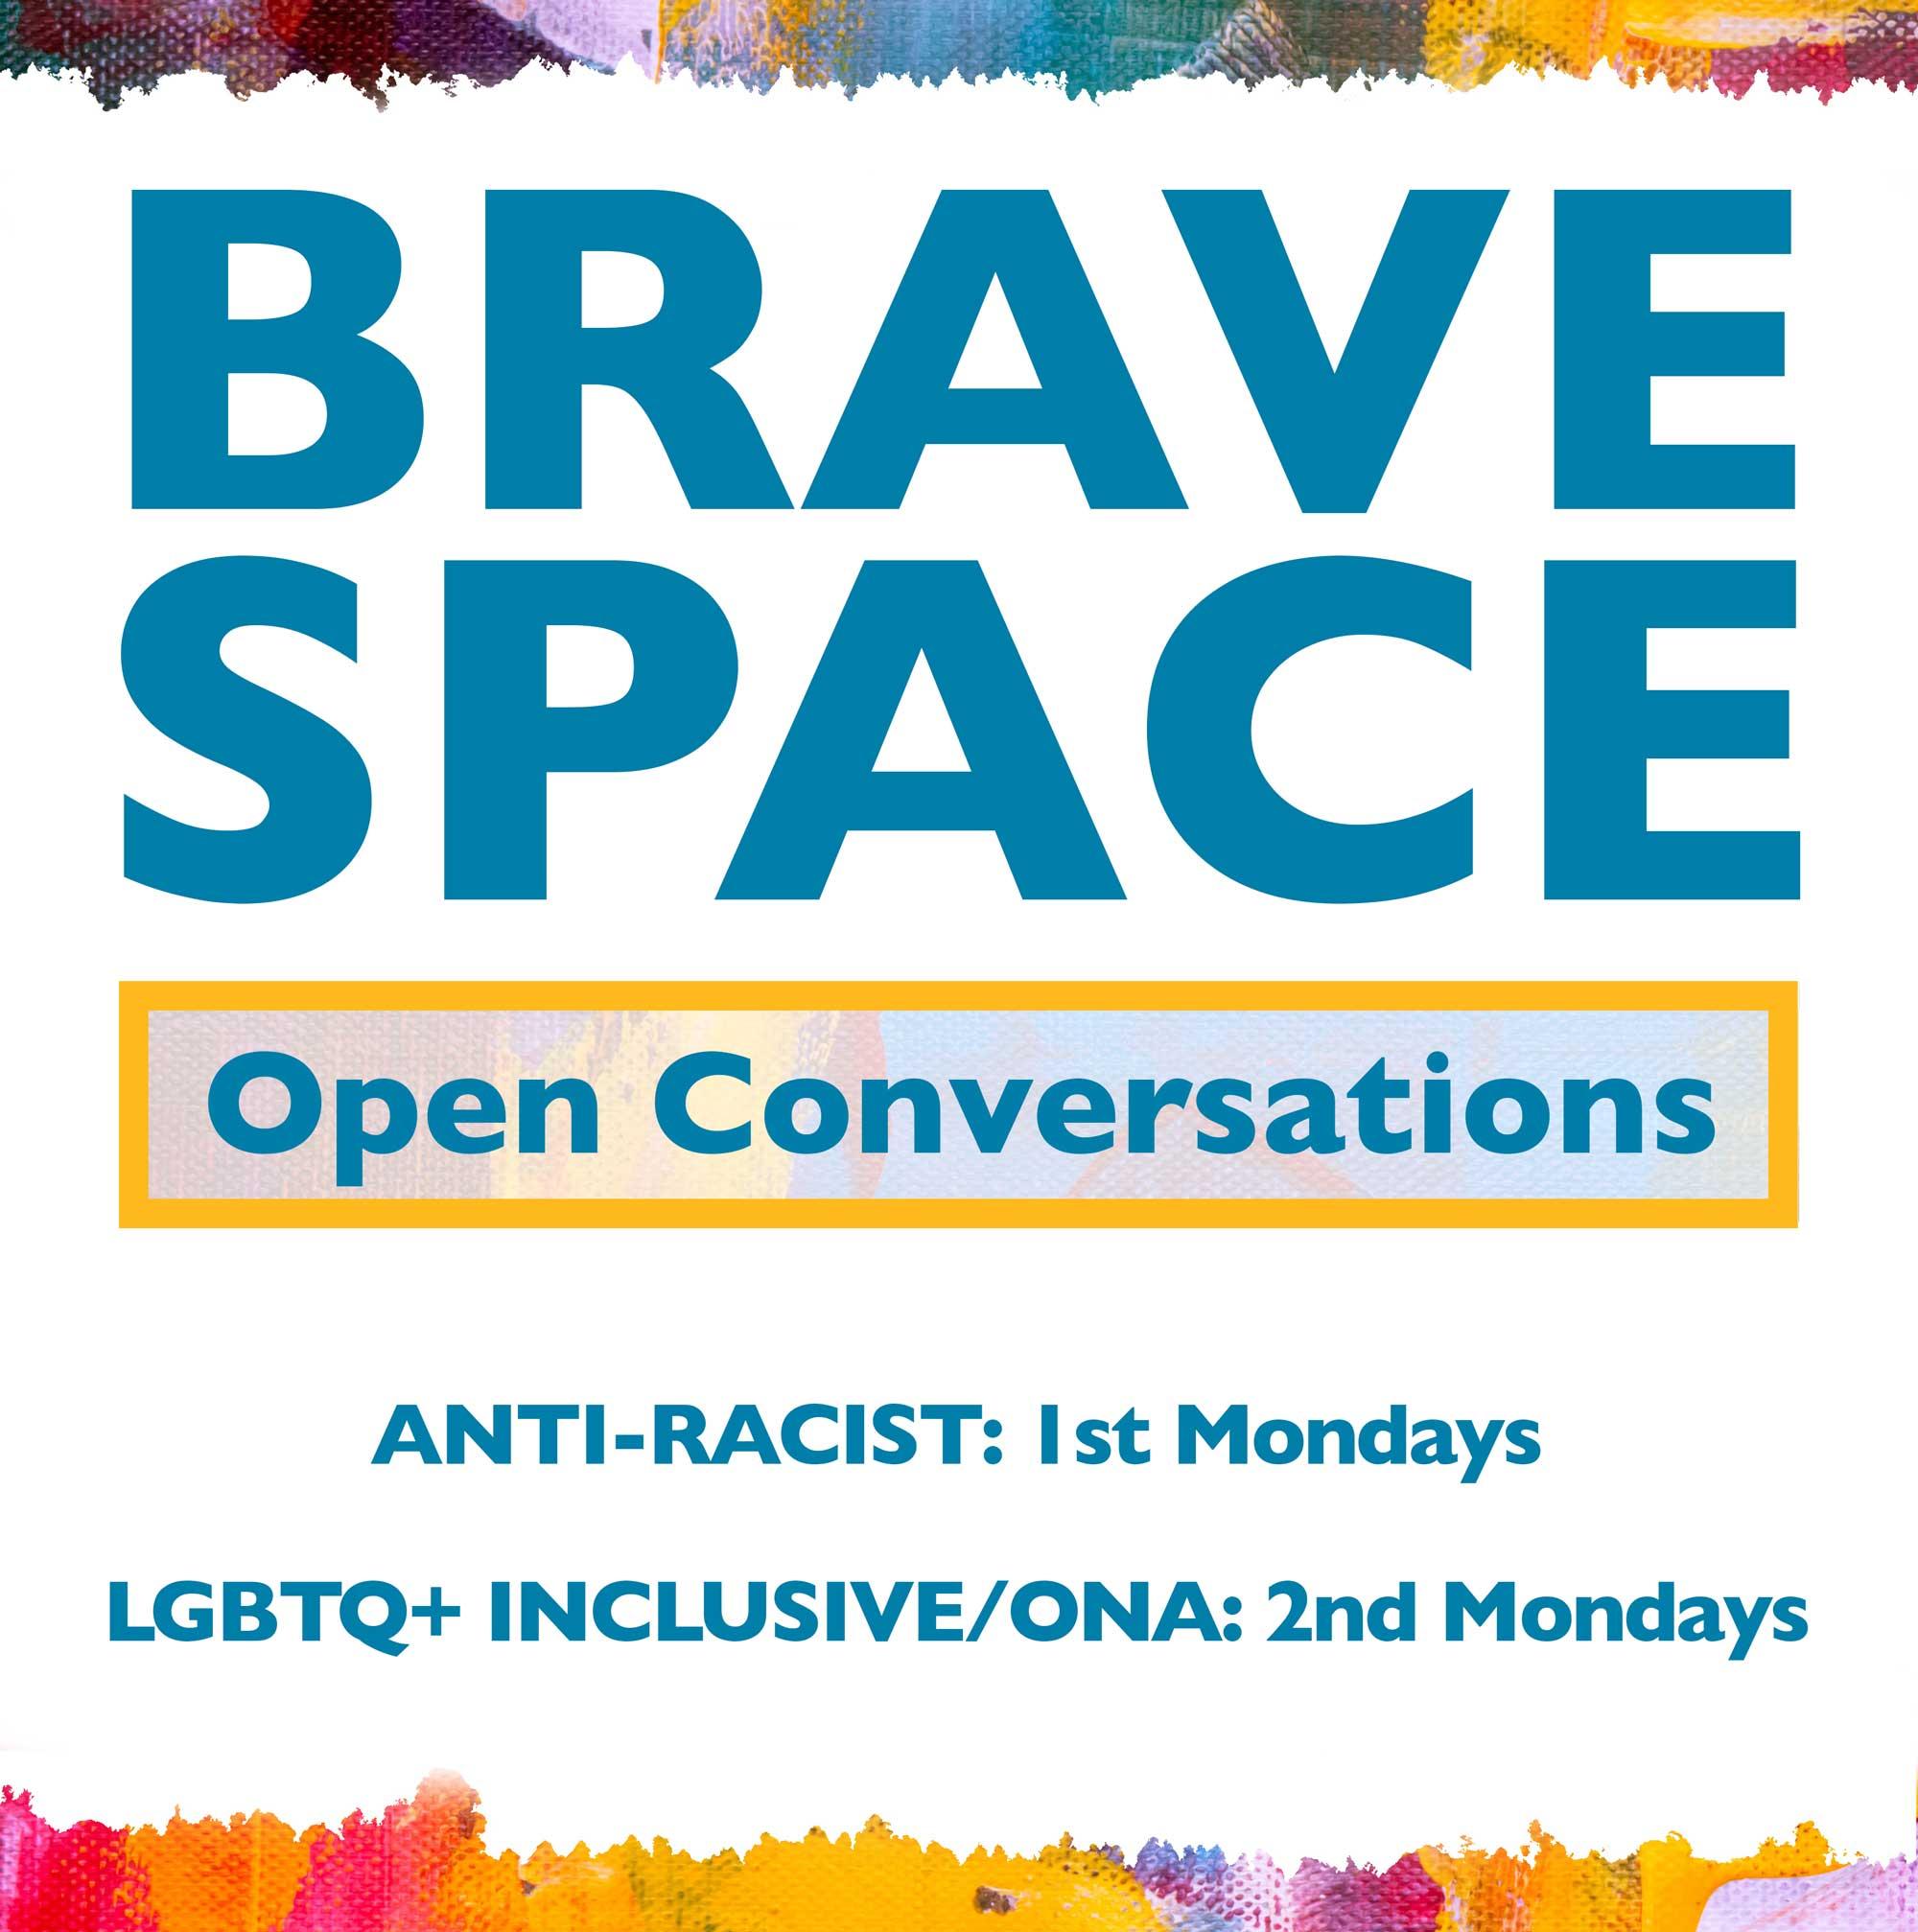 Brave Space Open Conversations. Anti-Racist: 1st Mondays. LGBTQ+ Inclusive/ONA: 2nd Mondays